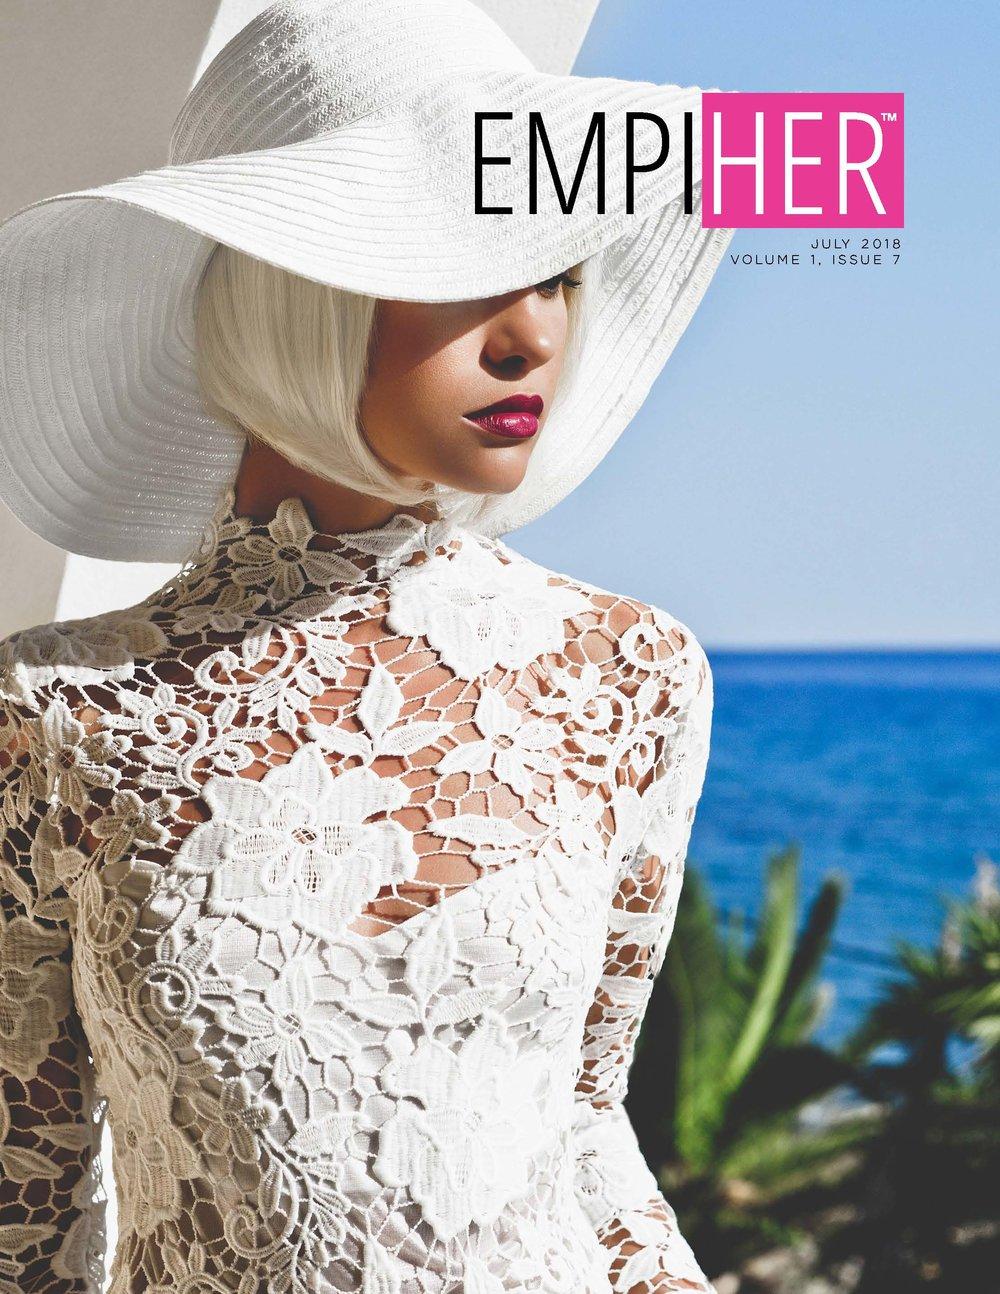 EmpiHER™ Vol 1, Issue 8